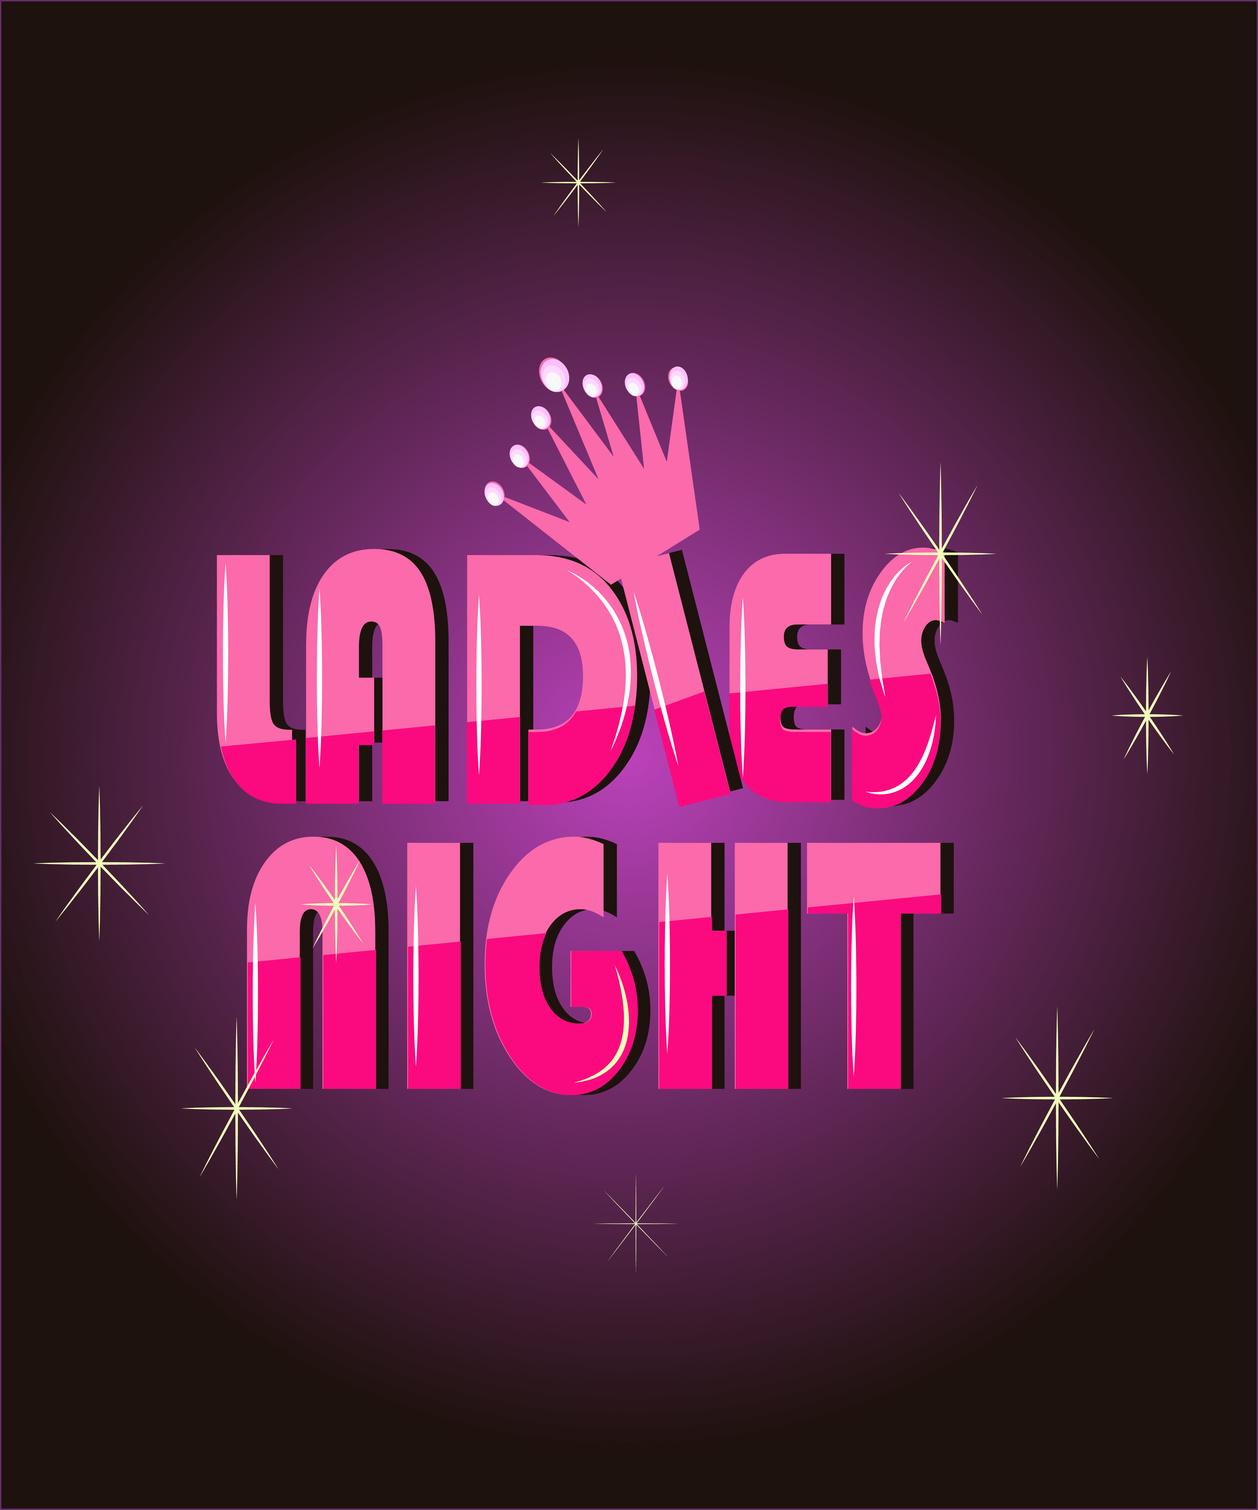 mankas steakhouse it 39 s ladies night tonight at mankas steakhouse. Black Bedroom Furniture Sets. Home Design Ideas